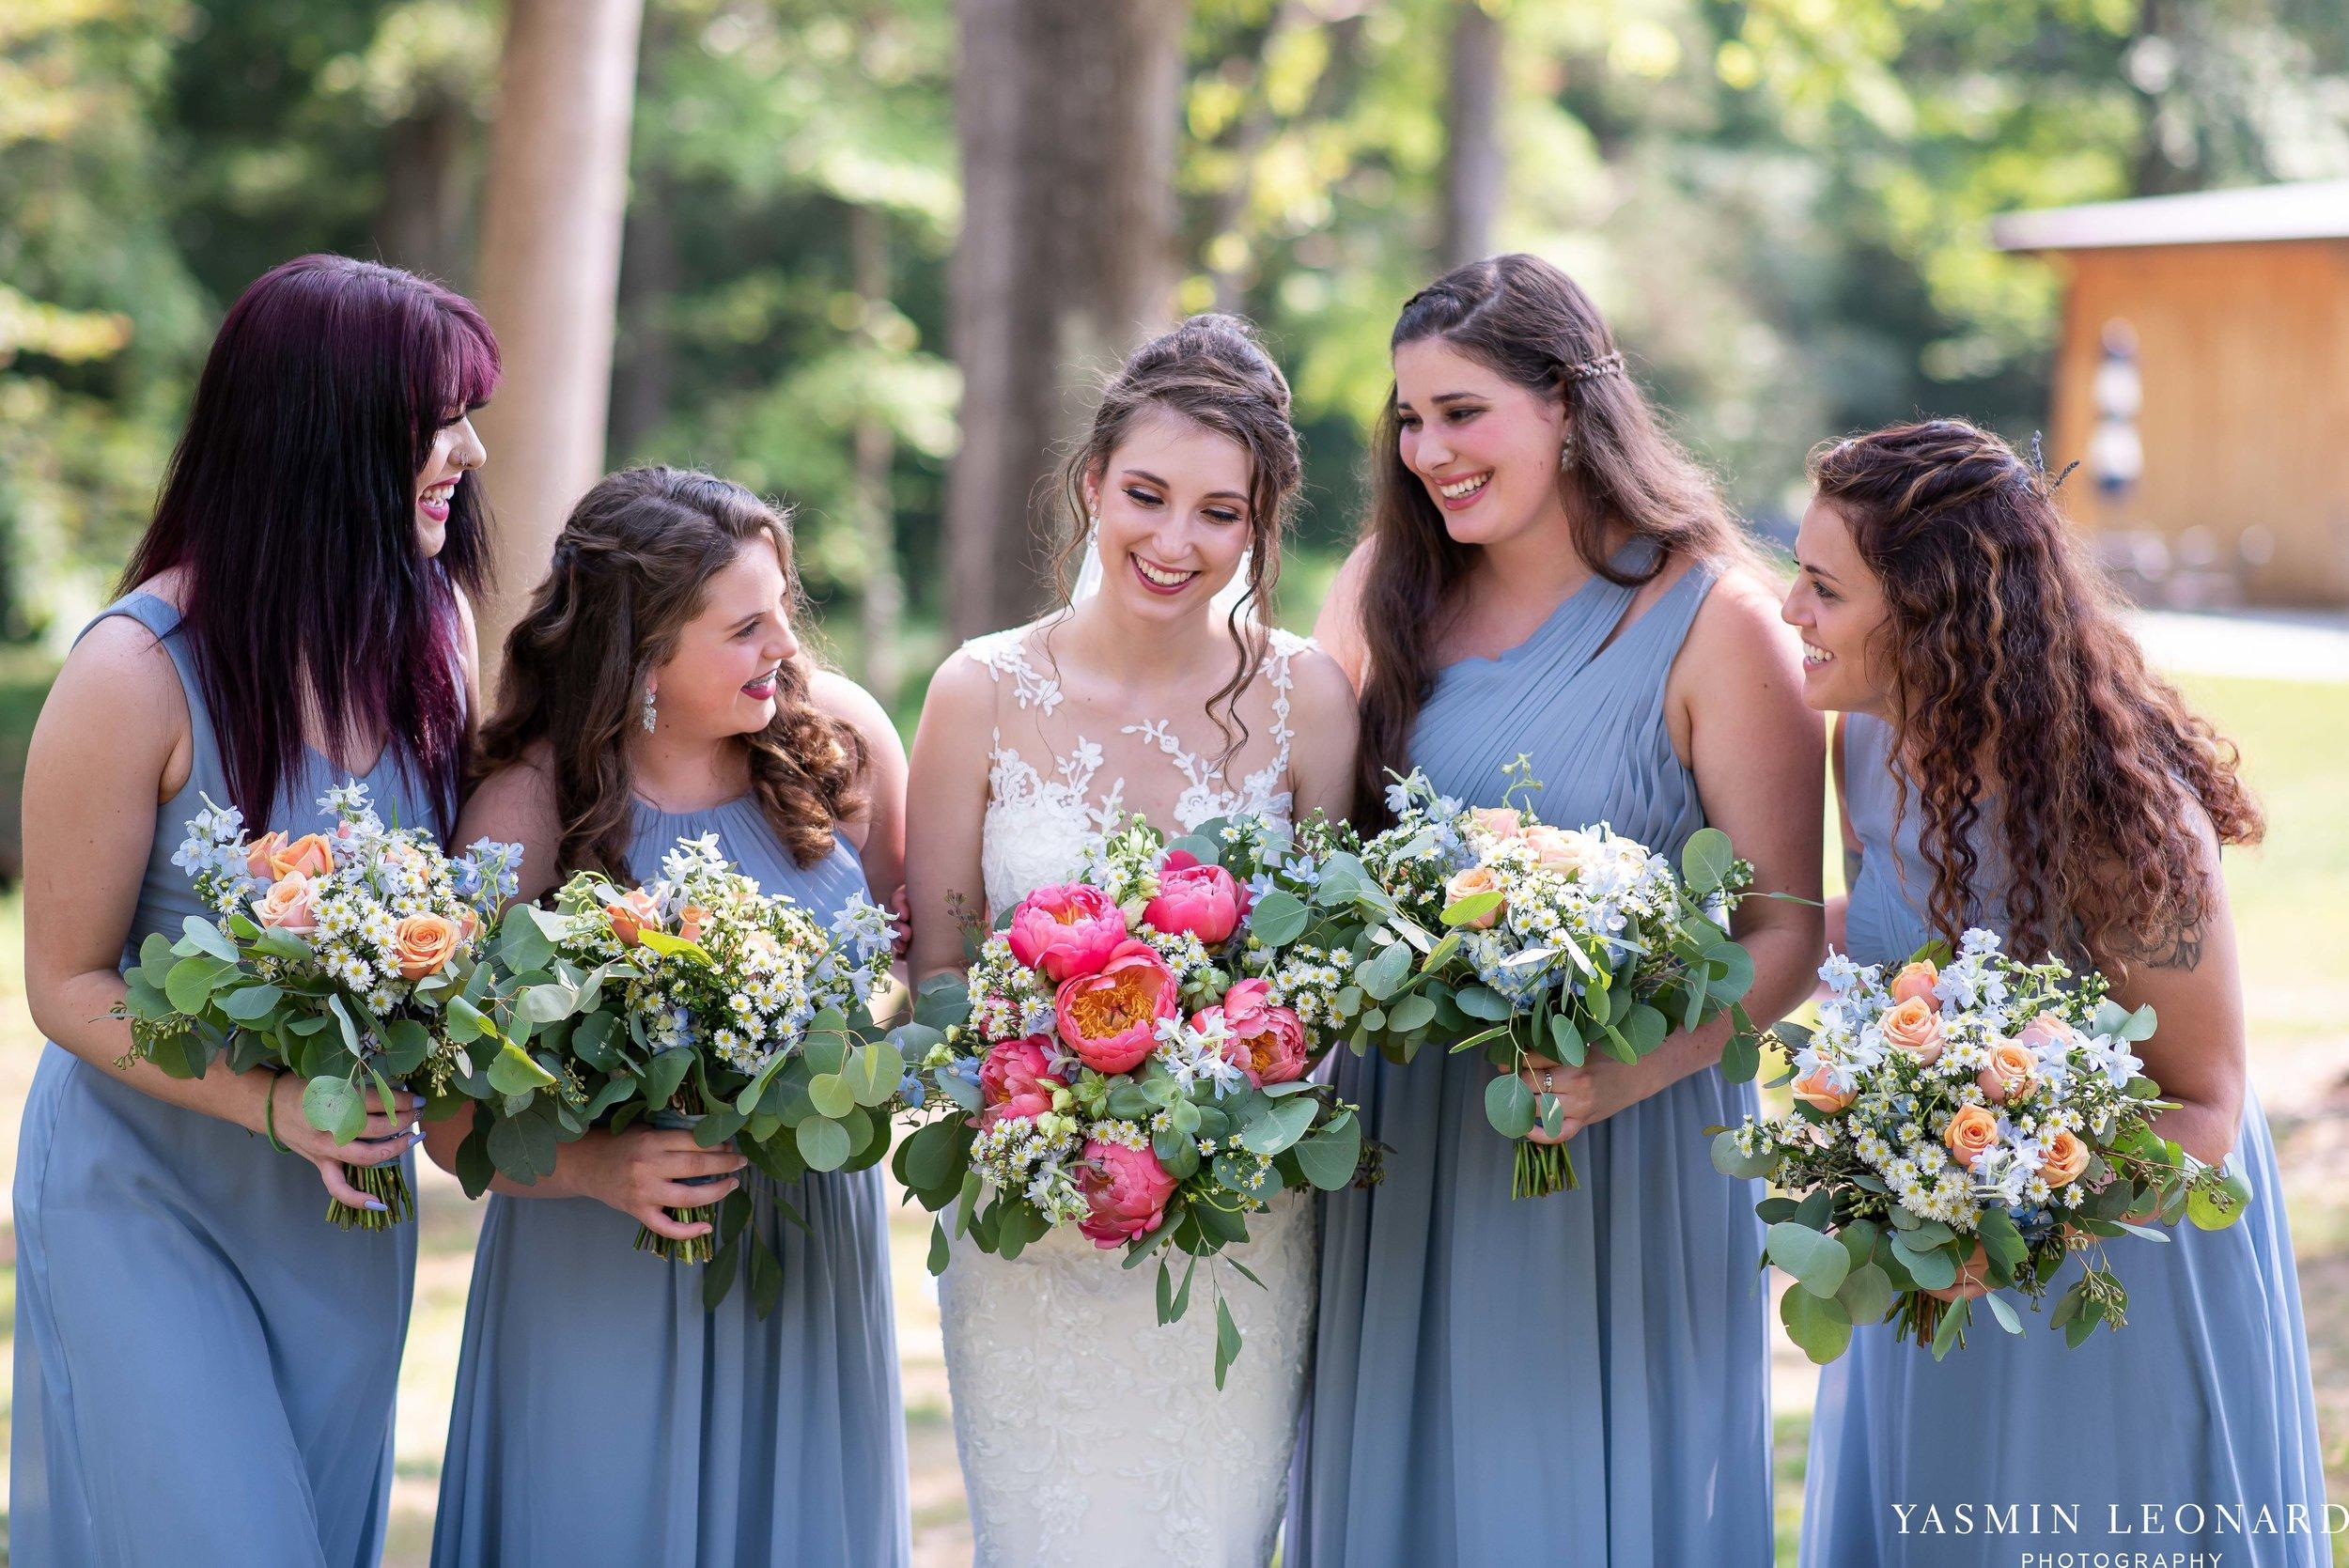 Old Homeplace Vineyard - NC Weddings - Outdoor Summer Weddings - Peony Boutique - Vineyard Wedding - NC Photographer - Yasmin Leonard Photography-17.jpg